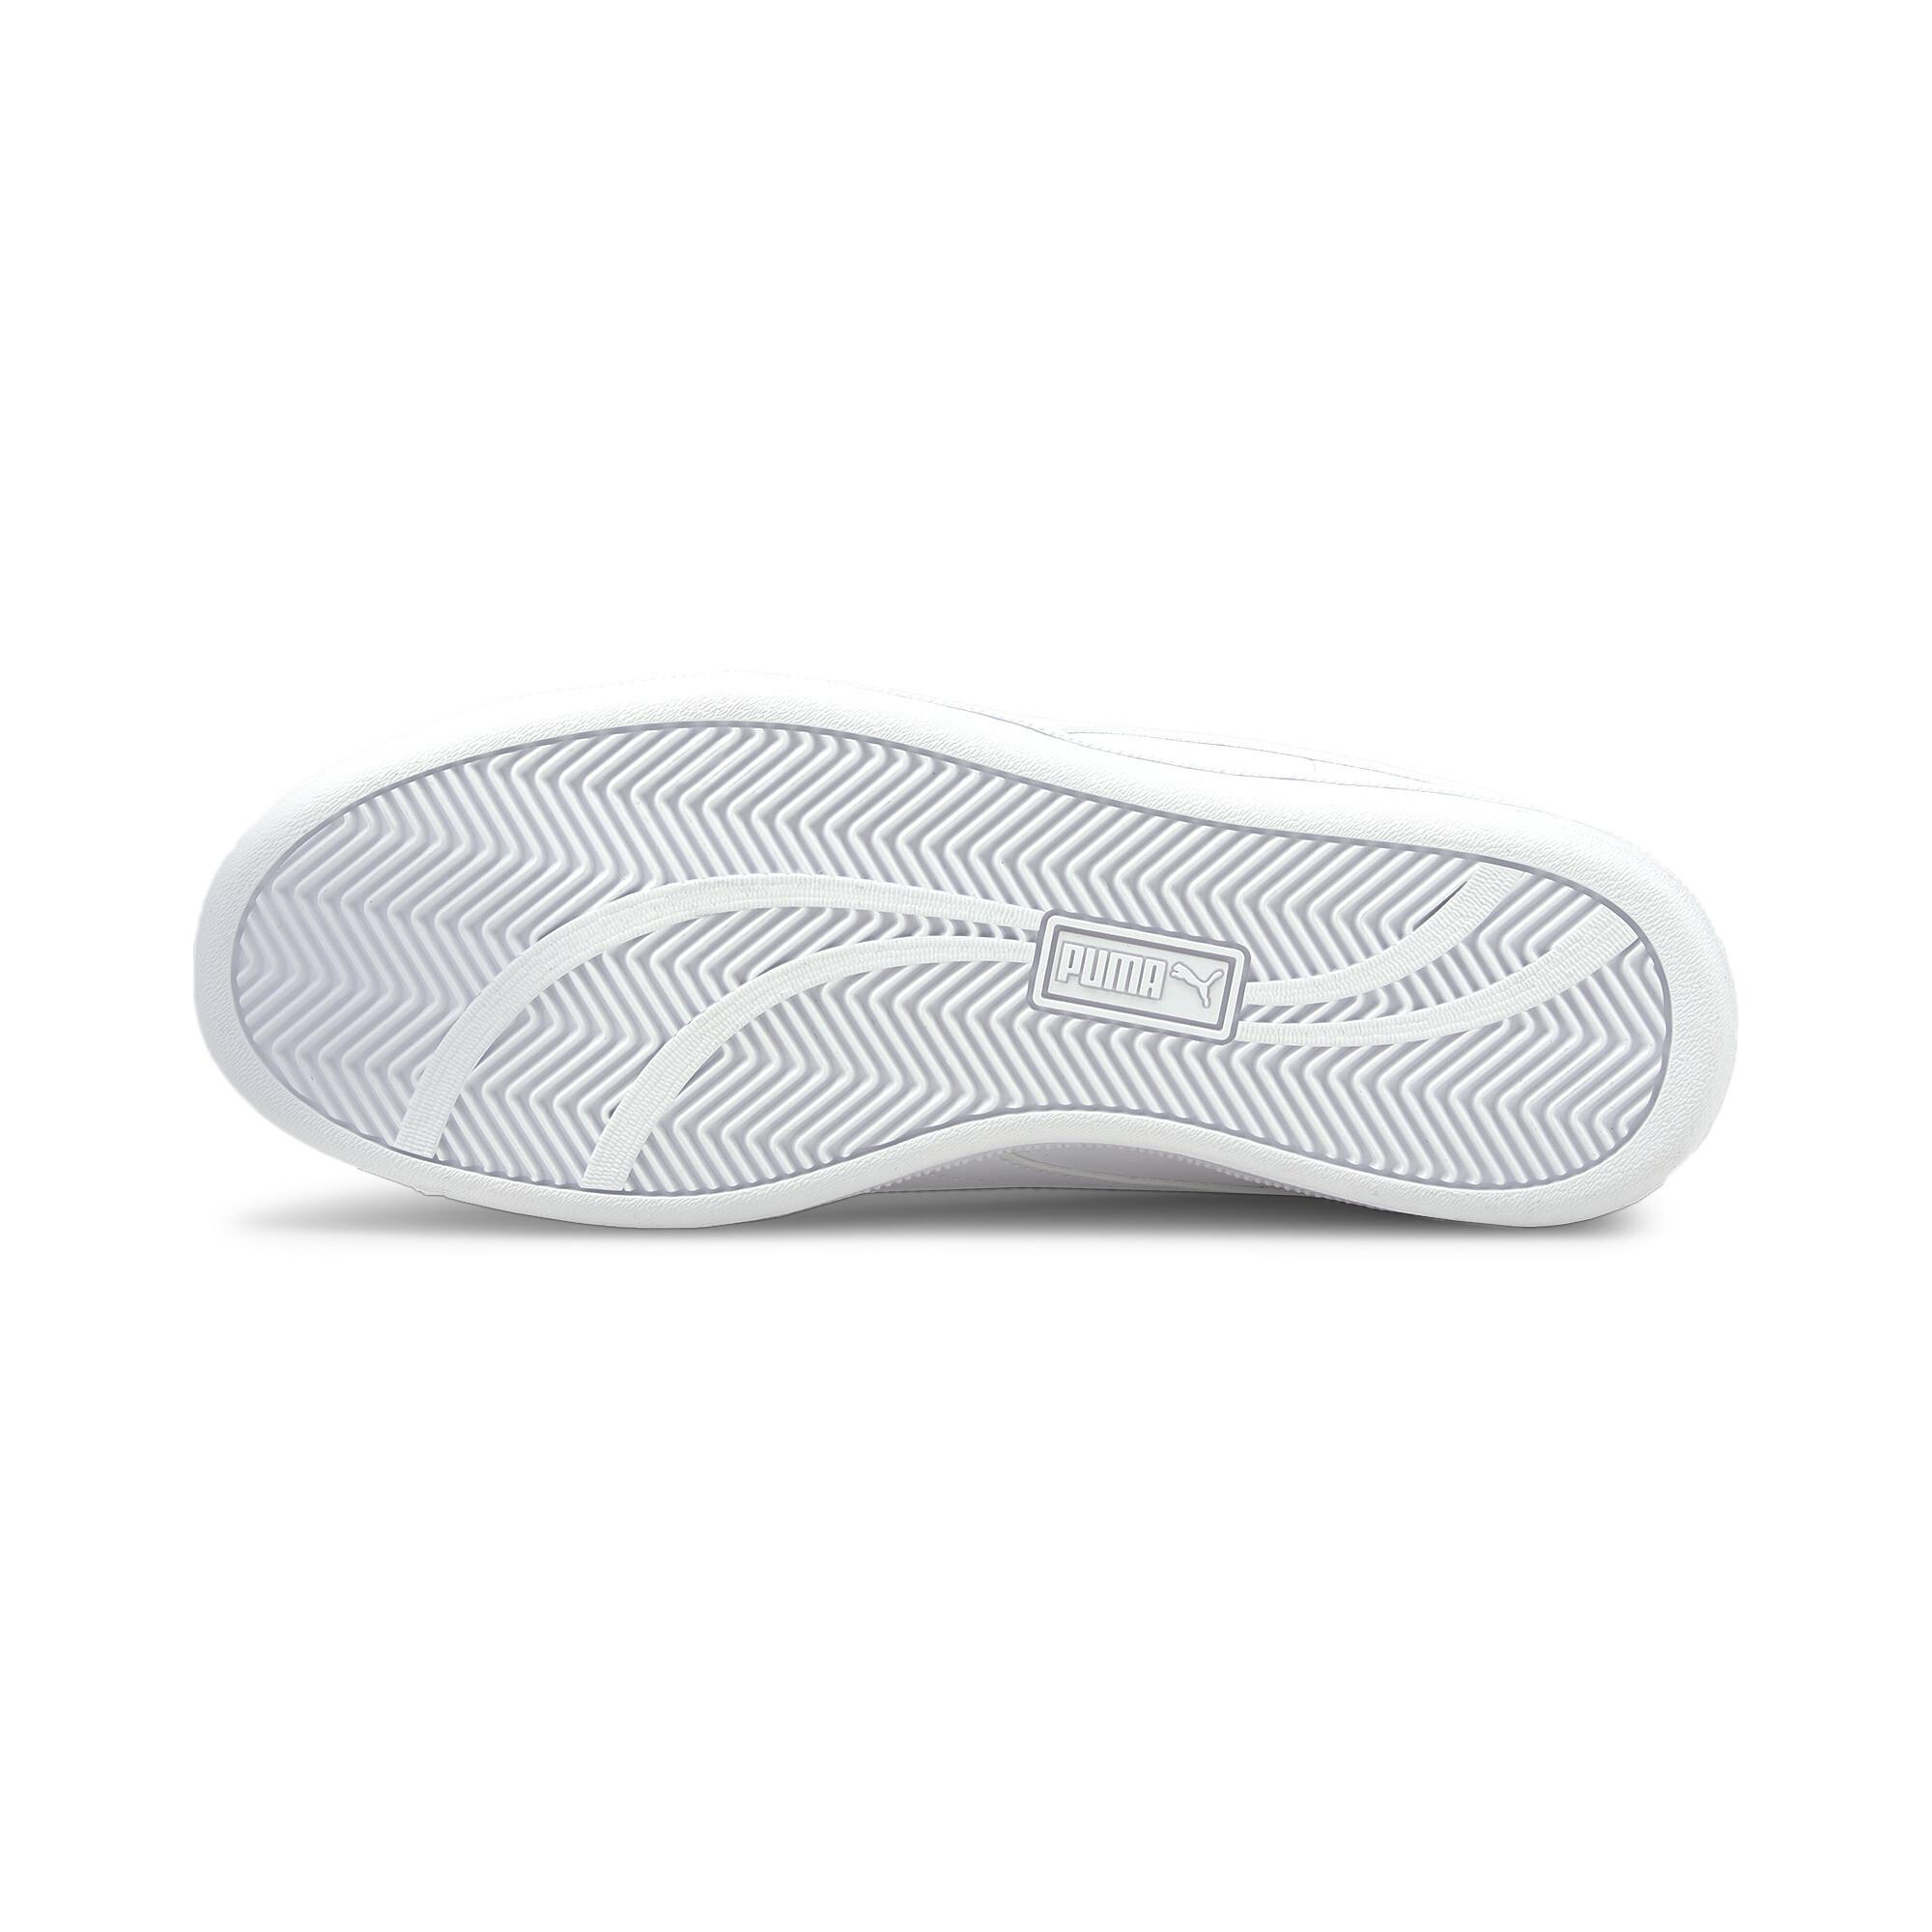 Indexbild 20 - PUMA Smash Trainers Schuhe Sneakers Sport Classics Unisex Neu